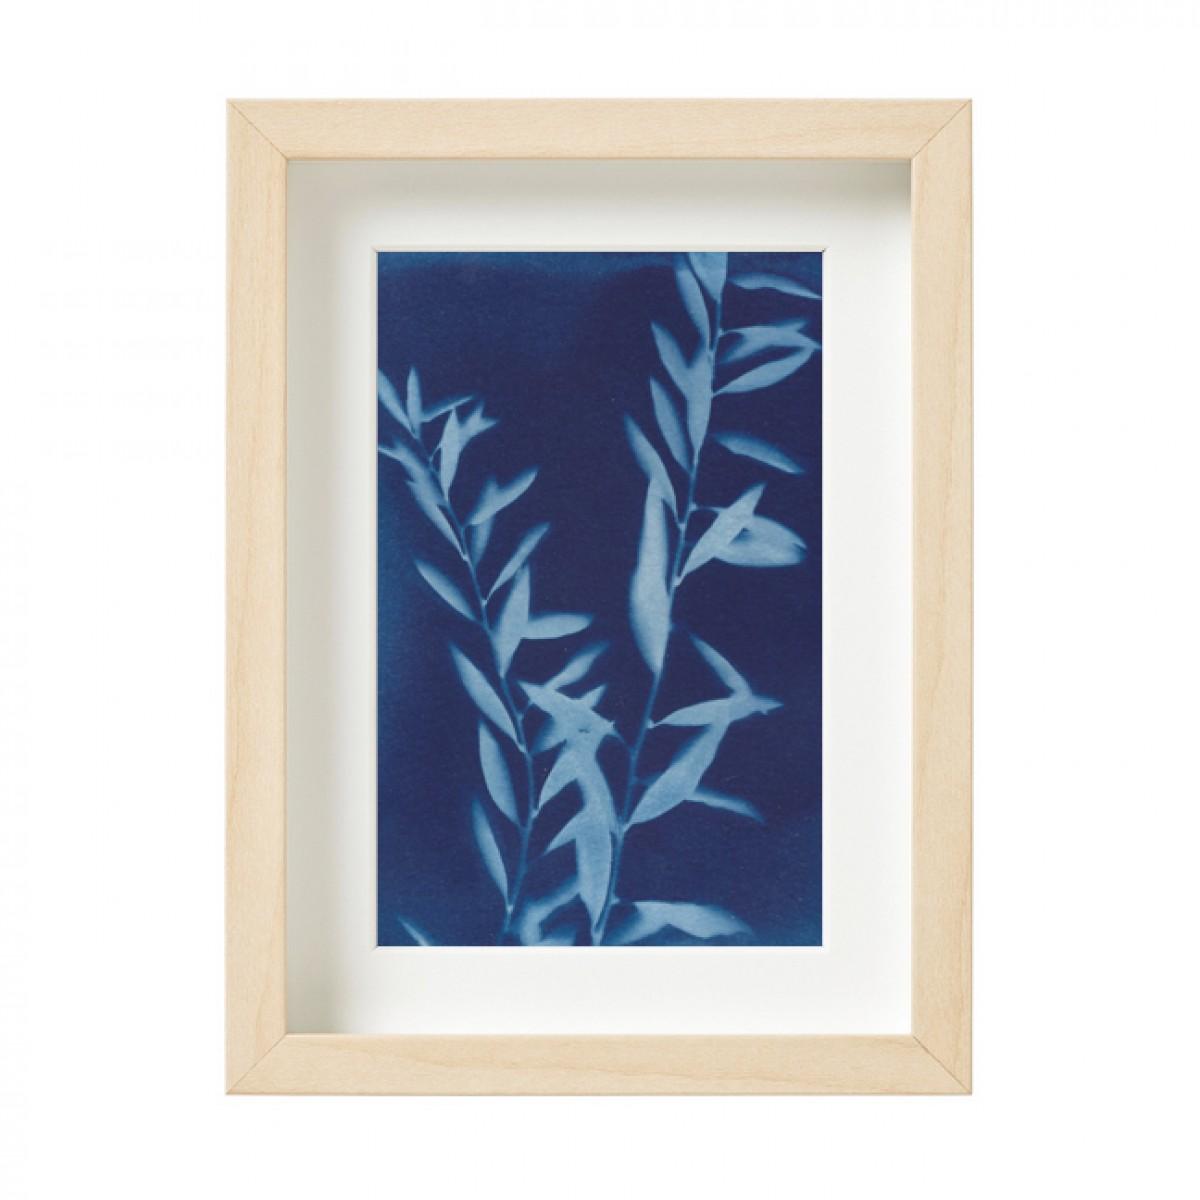 Anka Büchler, Floraler Blaudruck, Cyanotypie, Unikat, A6, gerahmt, Motiv 21